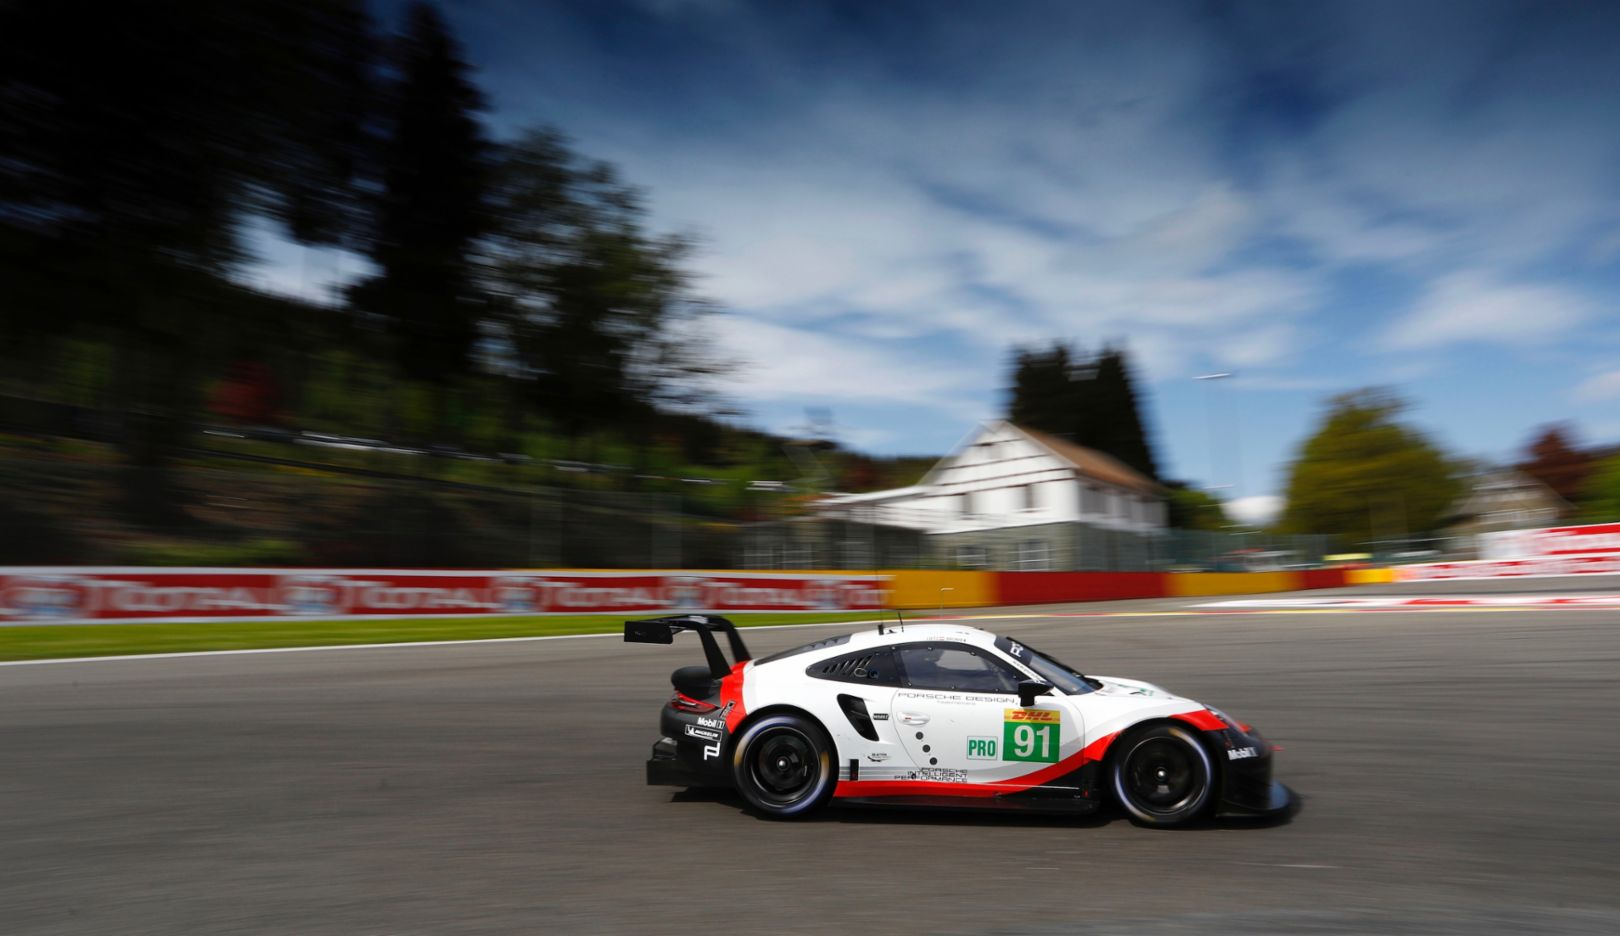 911 RSR, free practice, Spa-Francorchamps, FIA WEC, 2018, Porsche AG